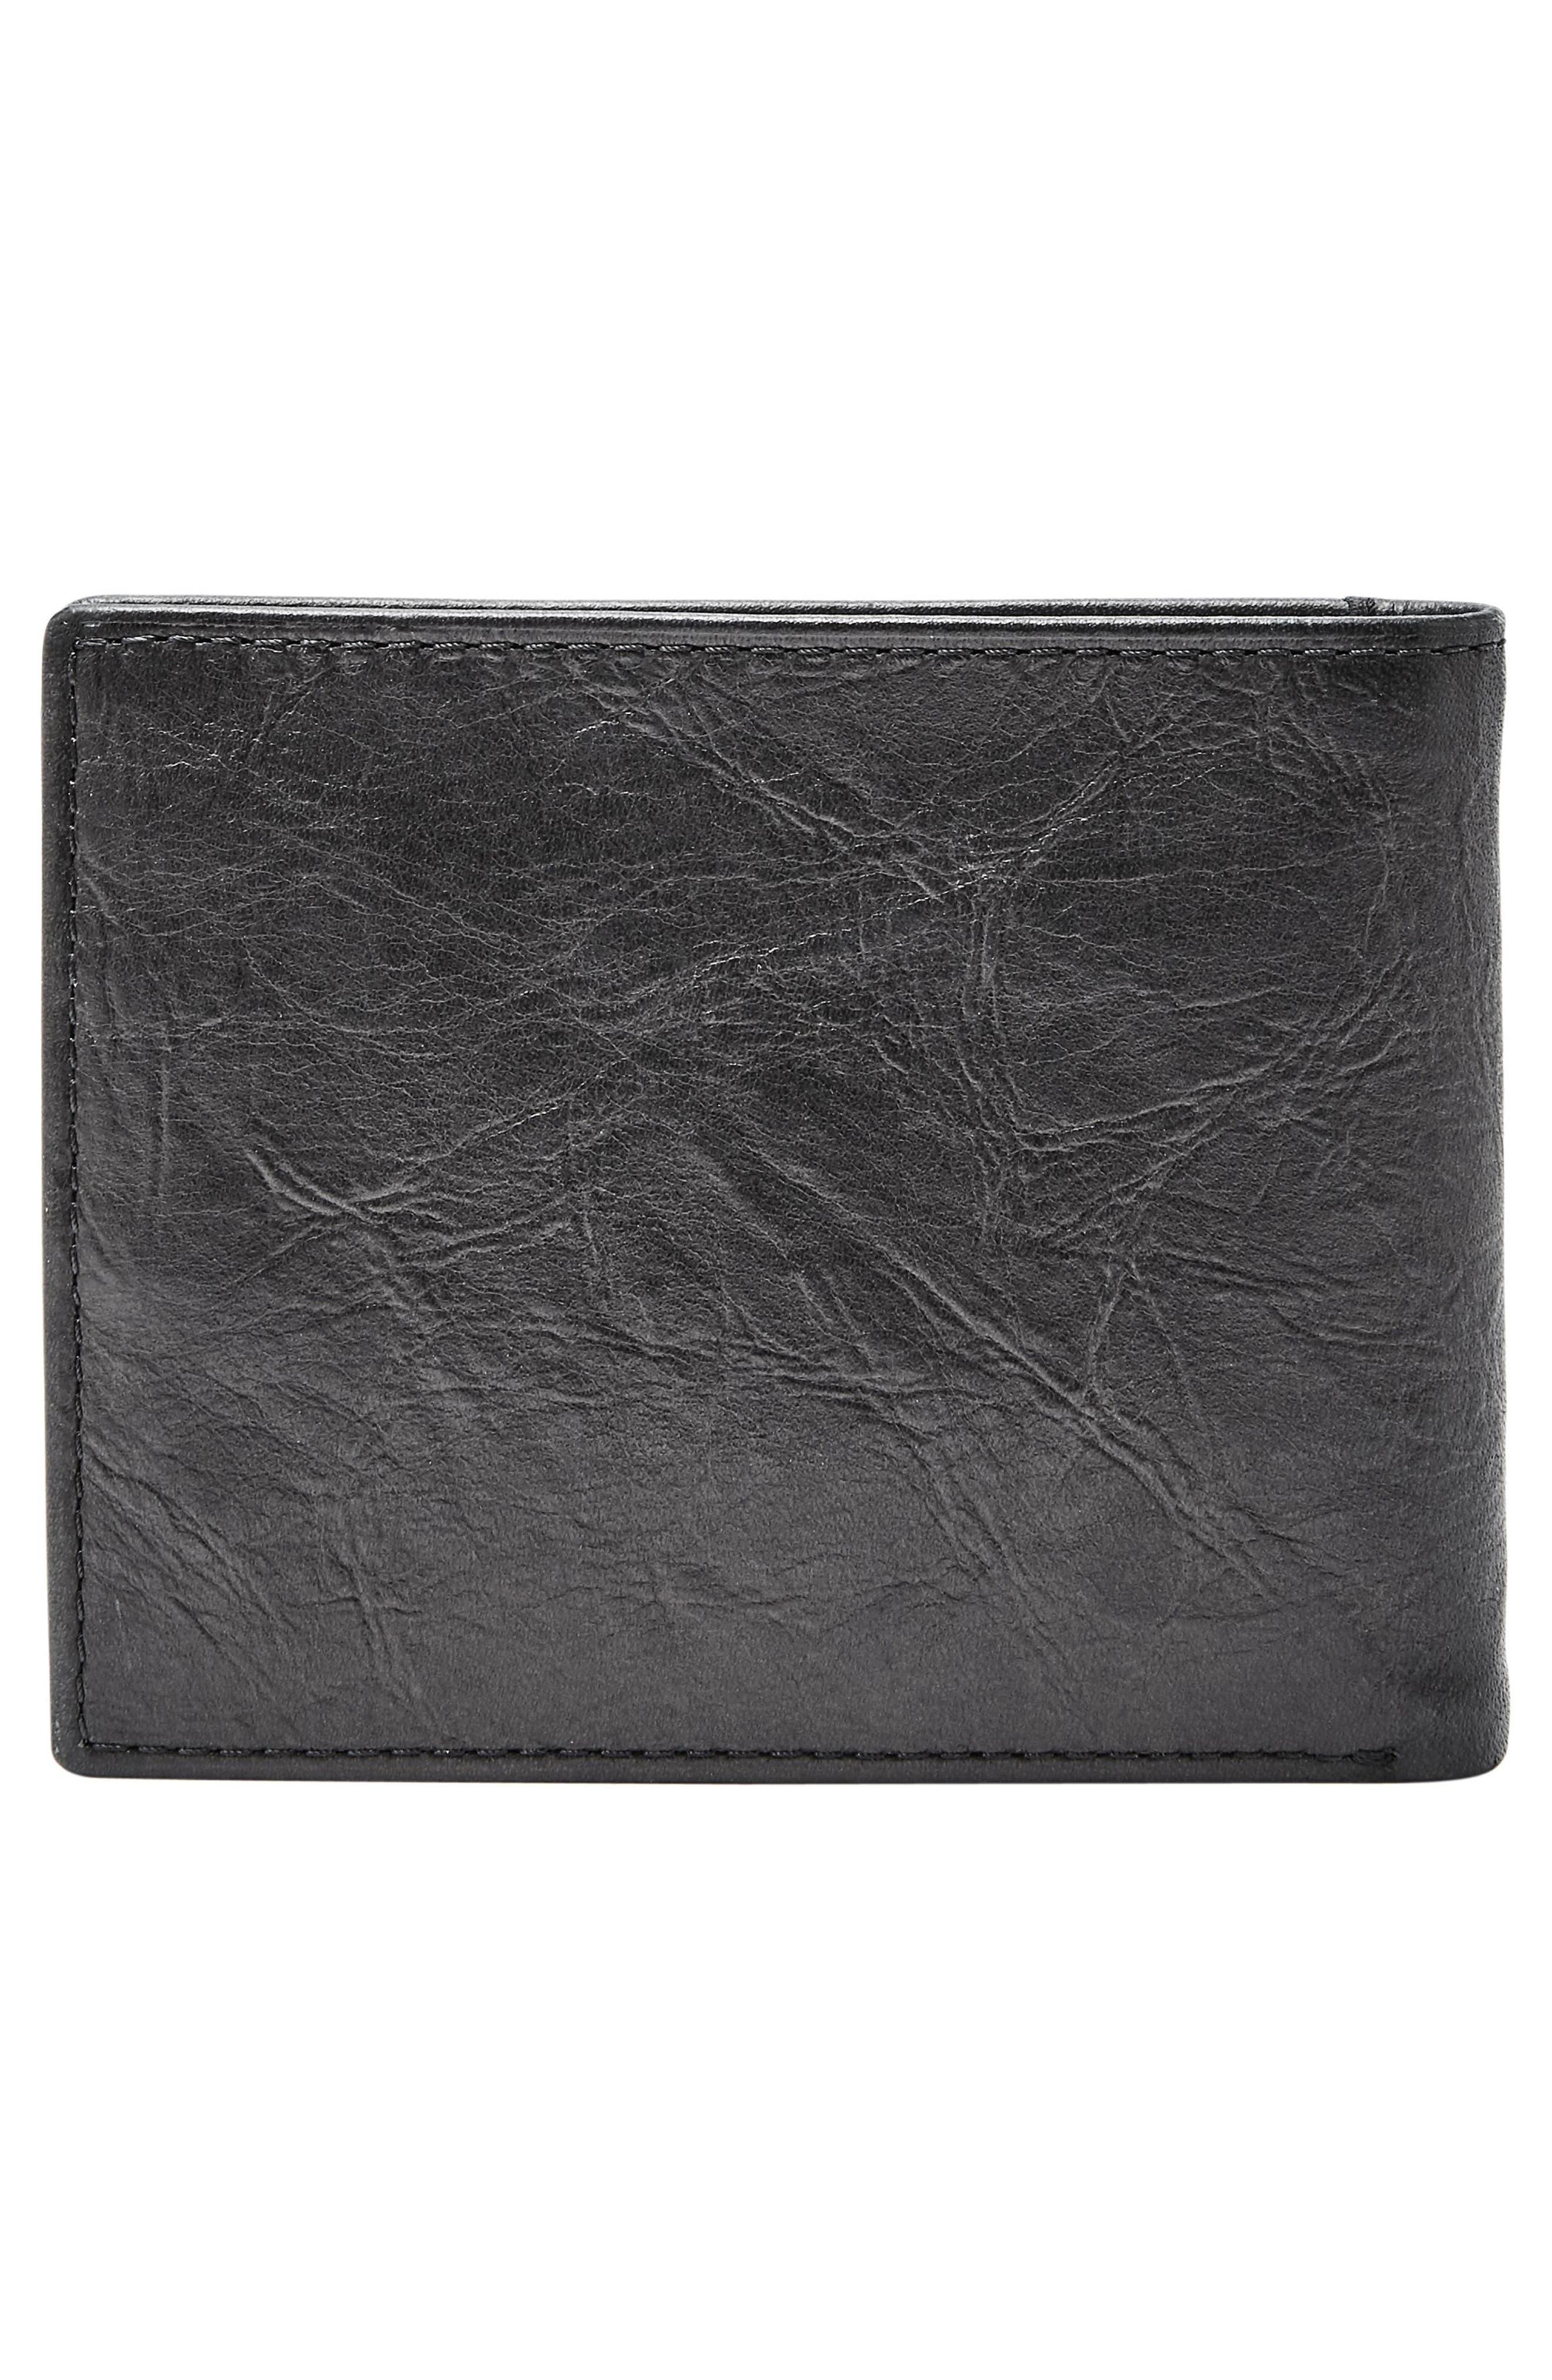 Leather Wallet,                             Alternate thumbnail 4, color,                             BLACK